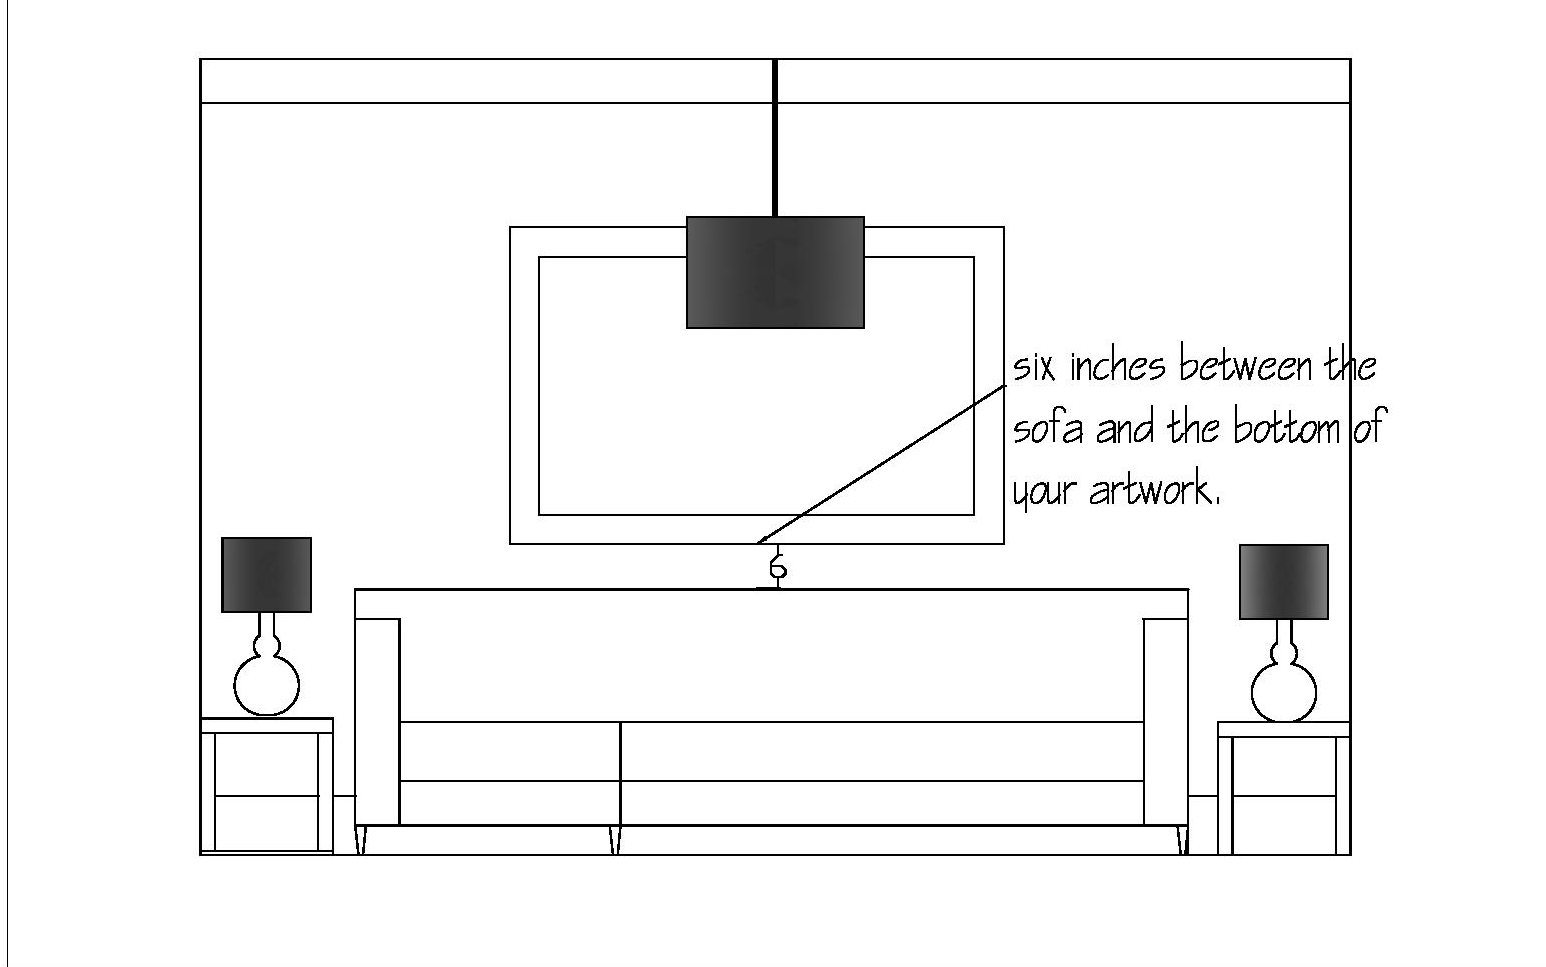 How to hang artwork over a sofa